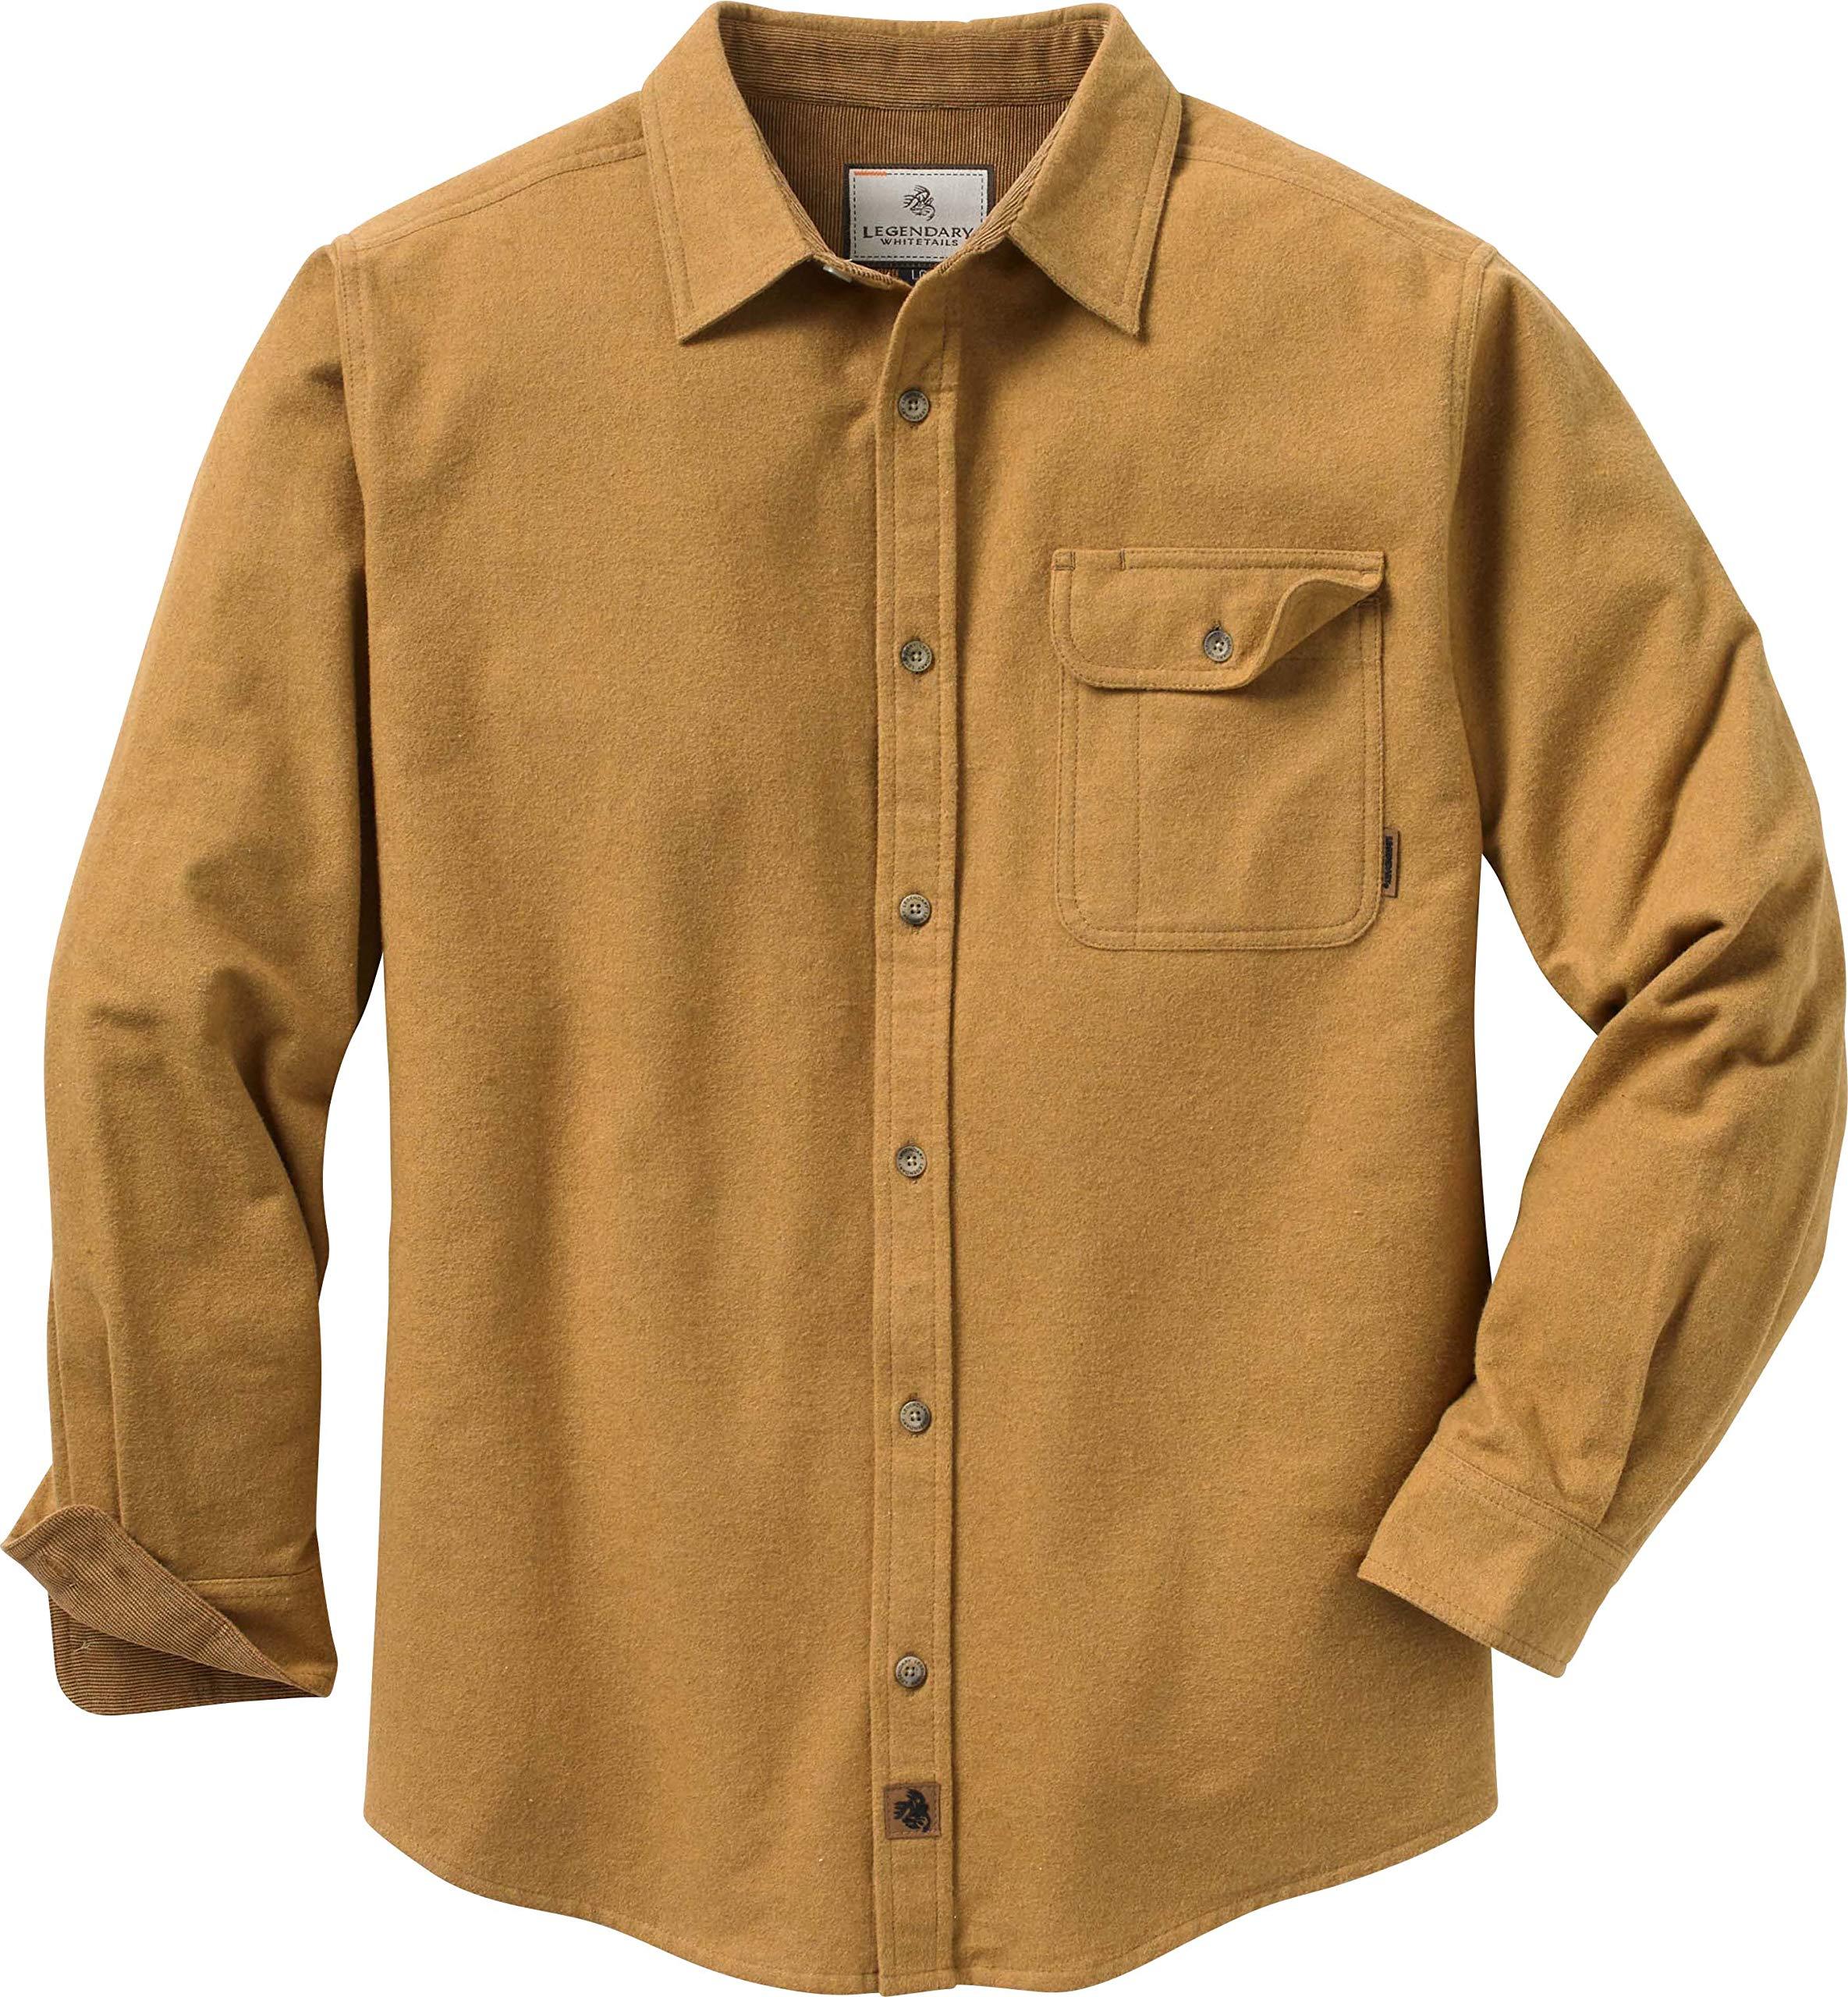 Legendary Whitetails Men/'s Buck Camp Flannels Solid Heather